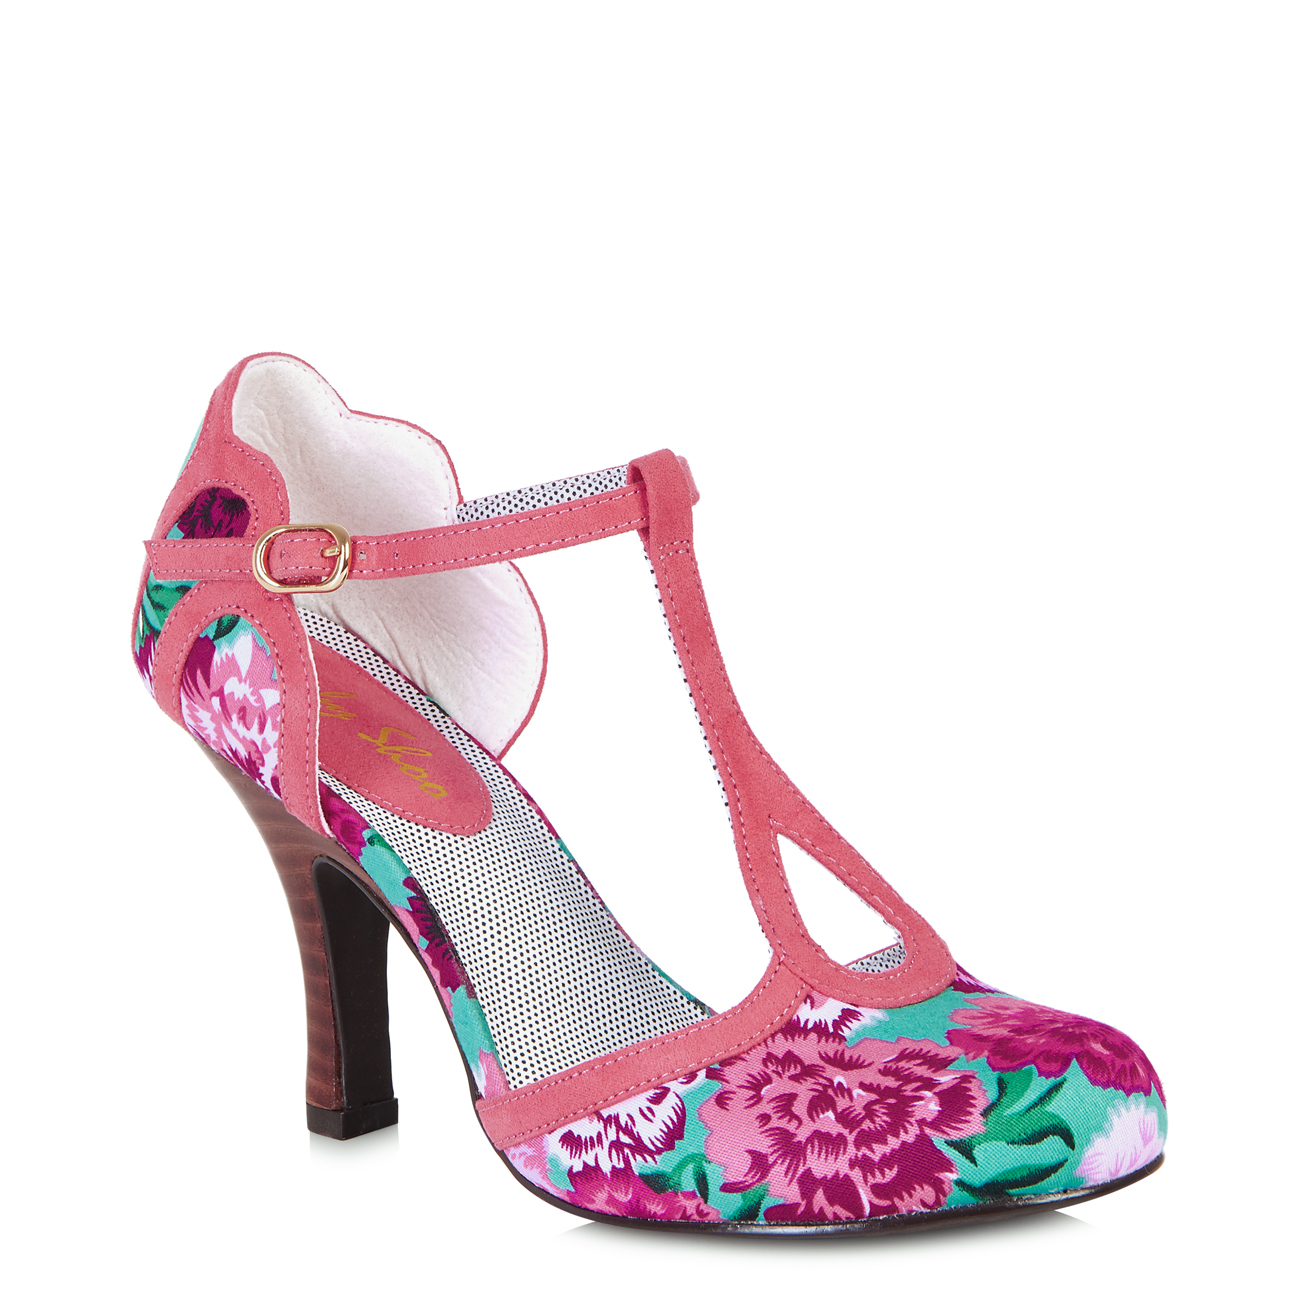 Ruby Shoo Polly Coral Damenschuhe T Bar HEELS 8 Schuhes 6 UK 39 EU 8 HEELS US     60acab